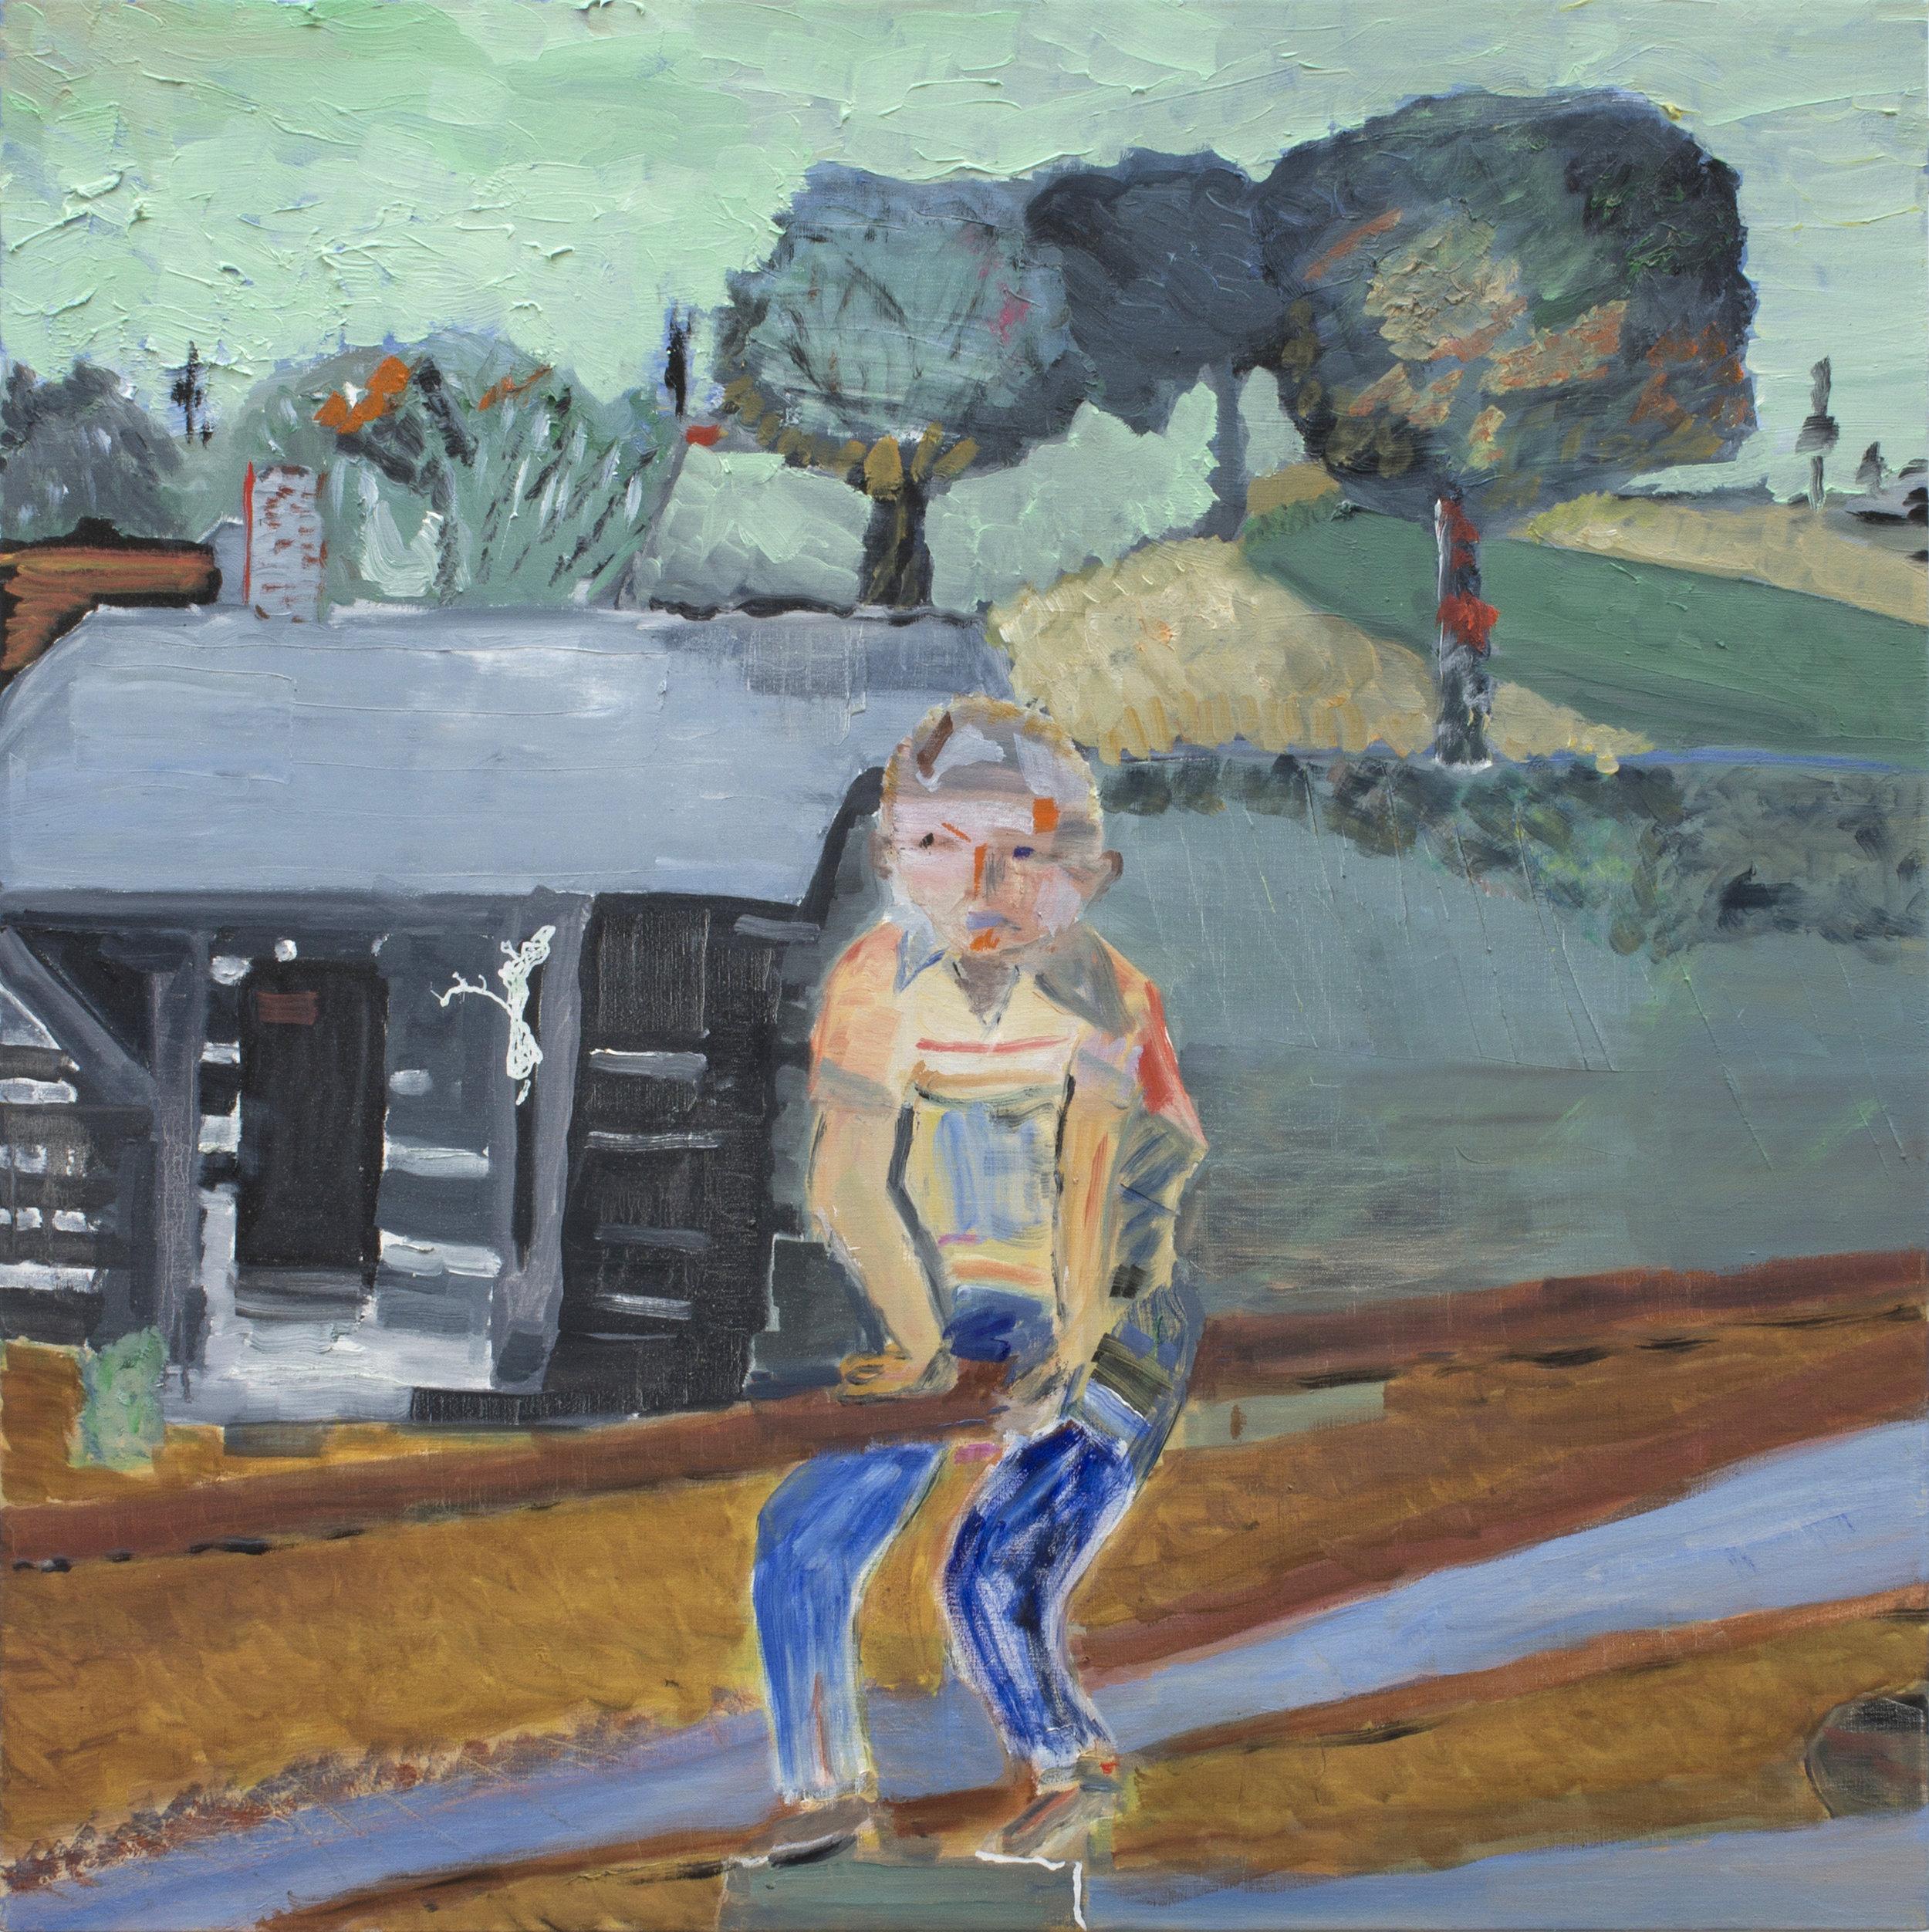 "Riding the Rail , 28 x 28"", oil on linen, 2015"